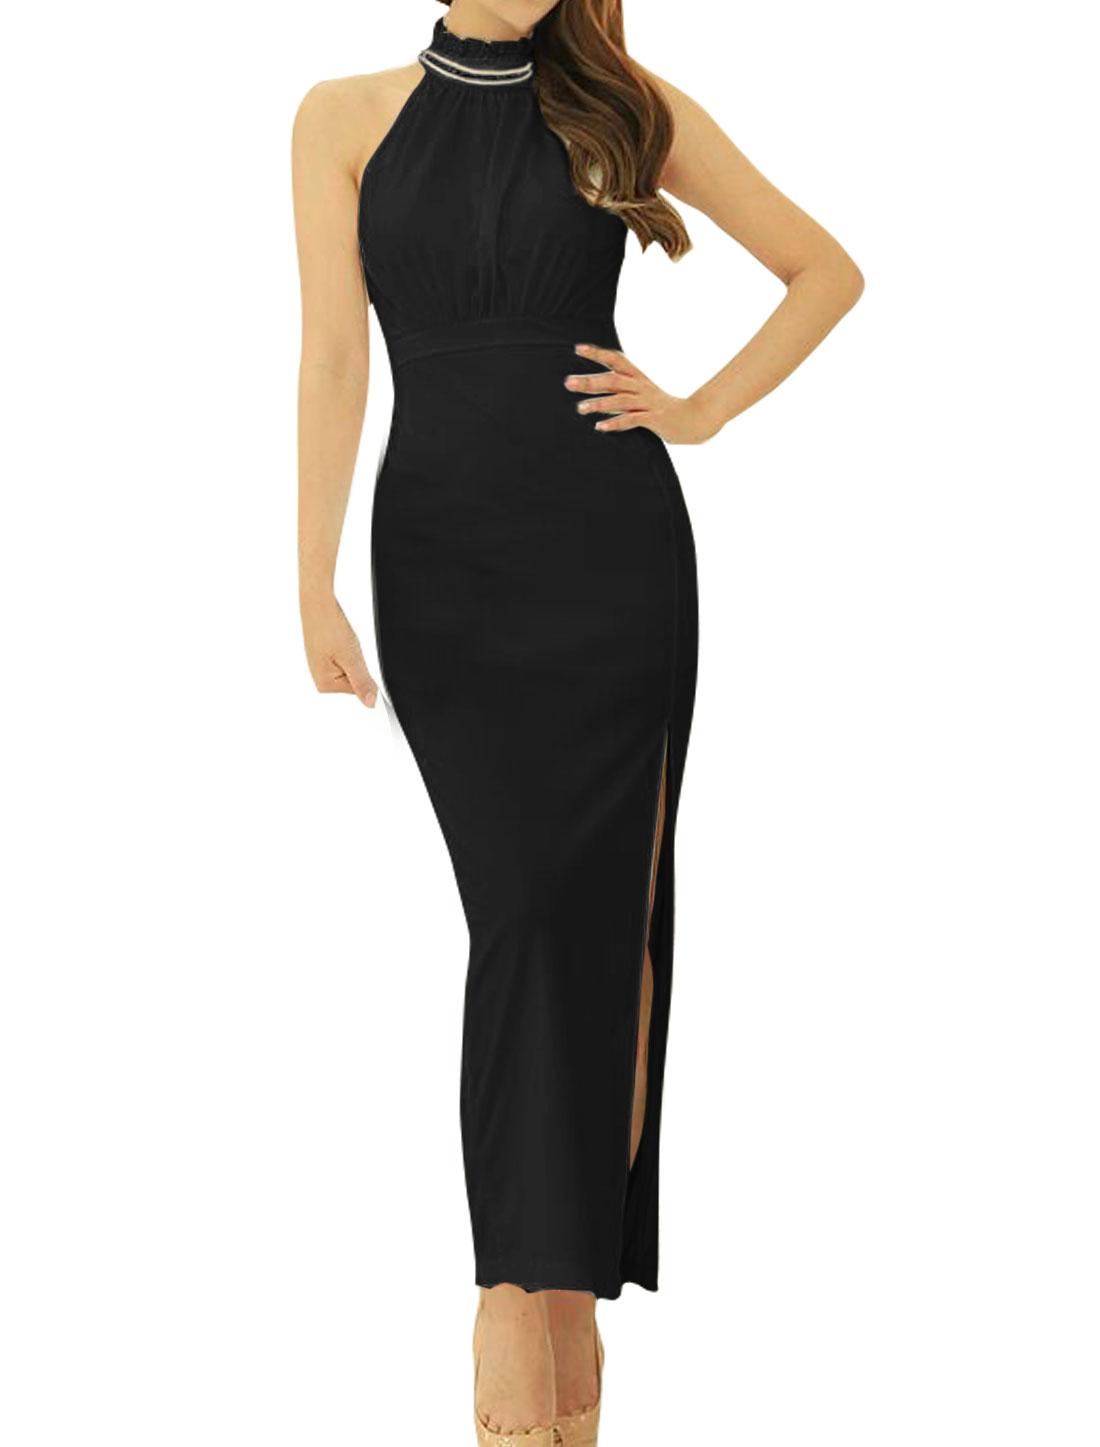 Women Rhinestones Decor Halter Neck High Split Maxi Dress Black XS